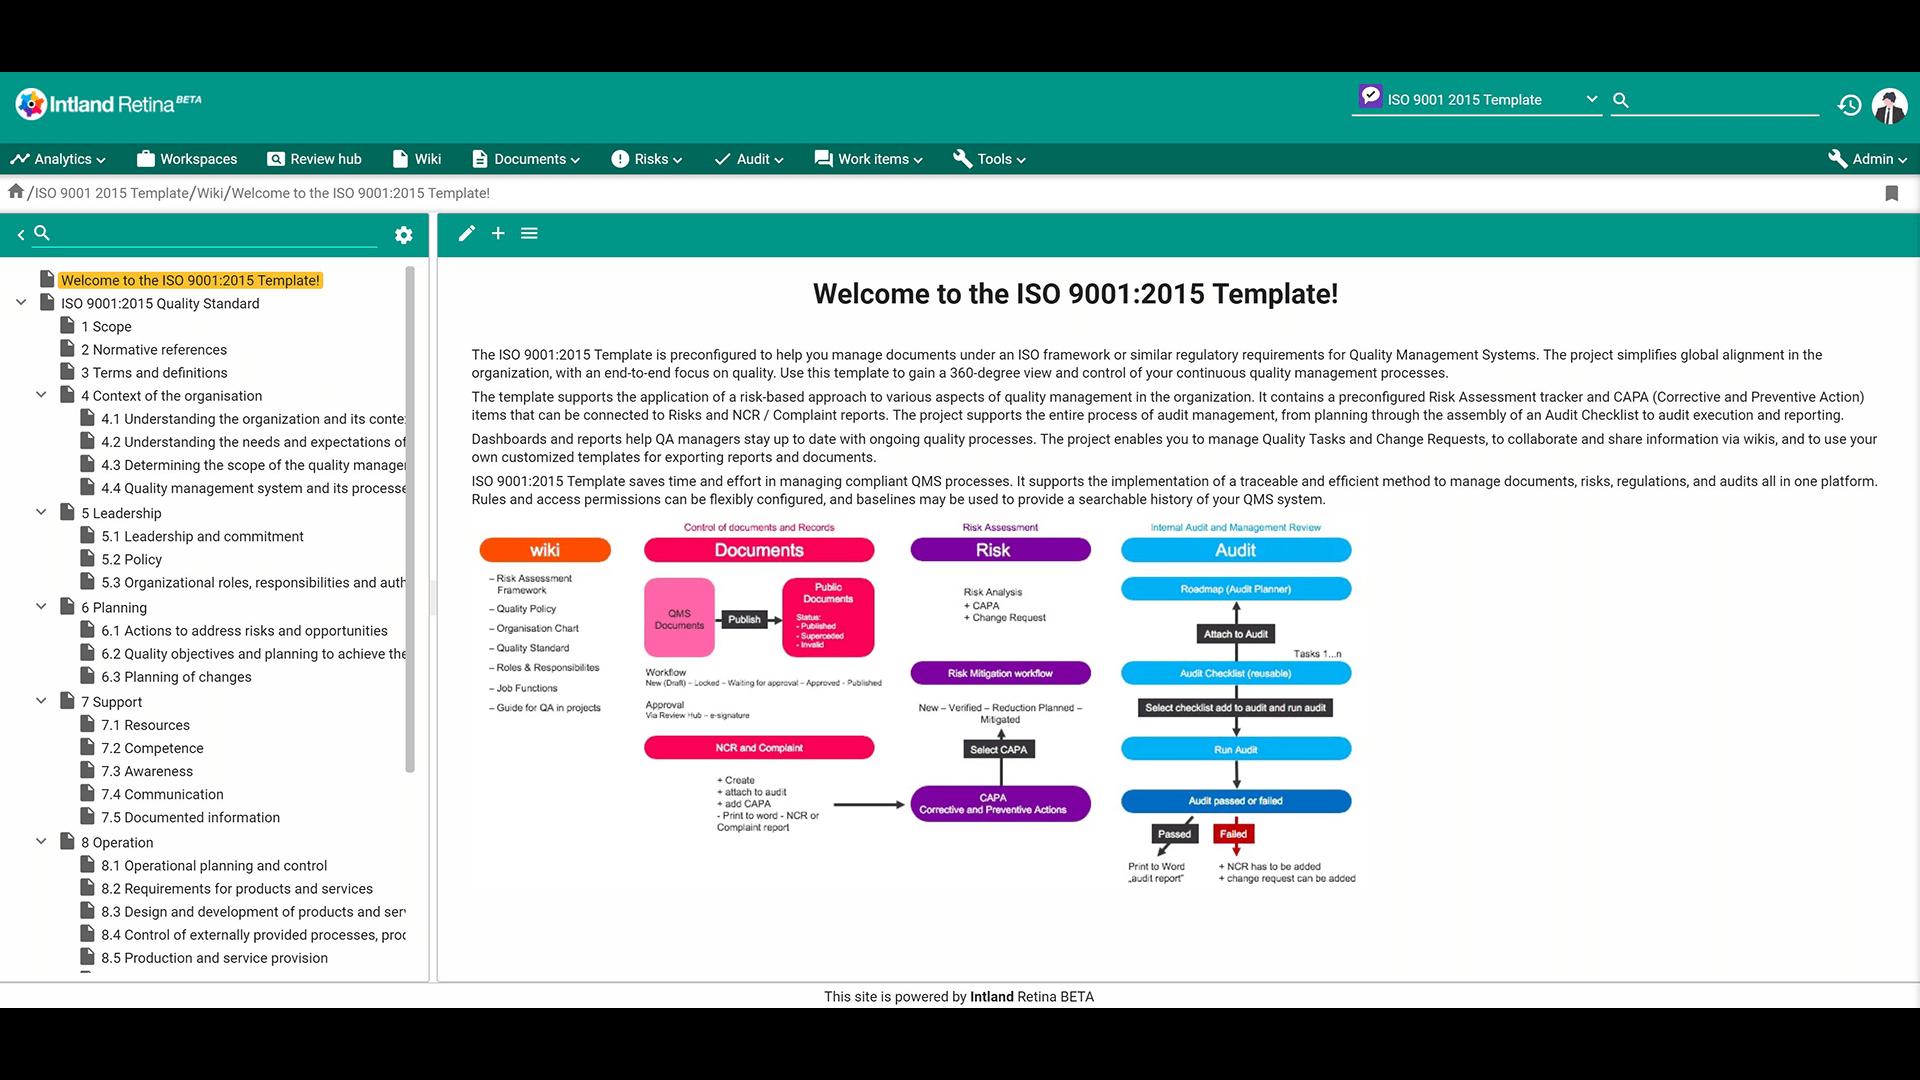 quality-process-management-wiki-references-regulatory-standards Intland Retina